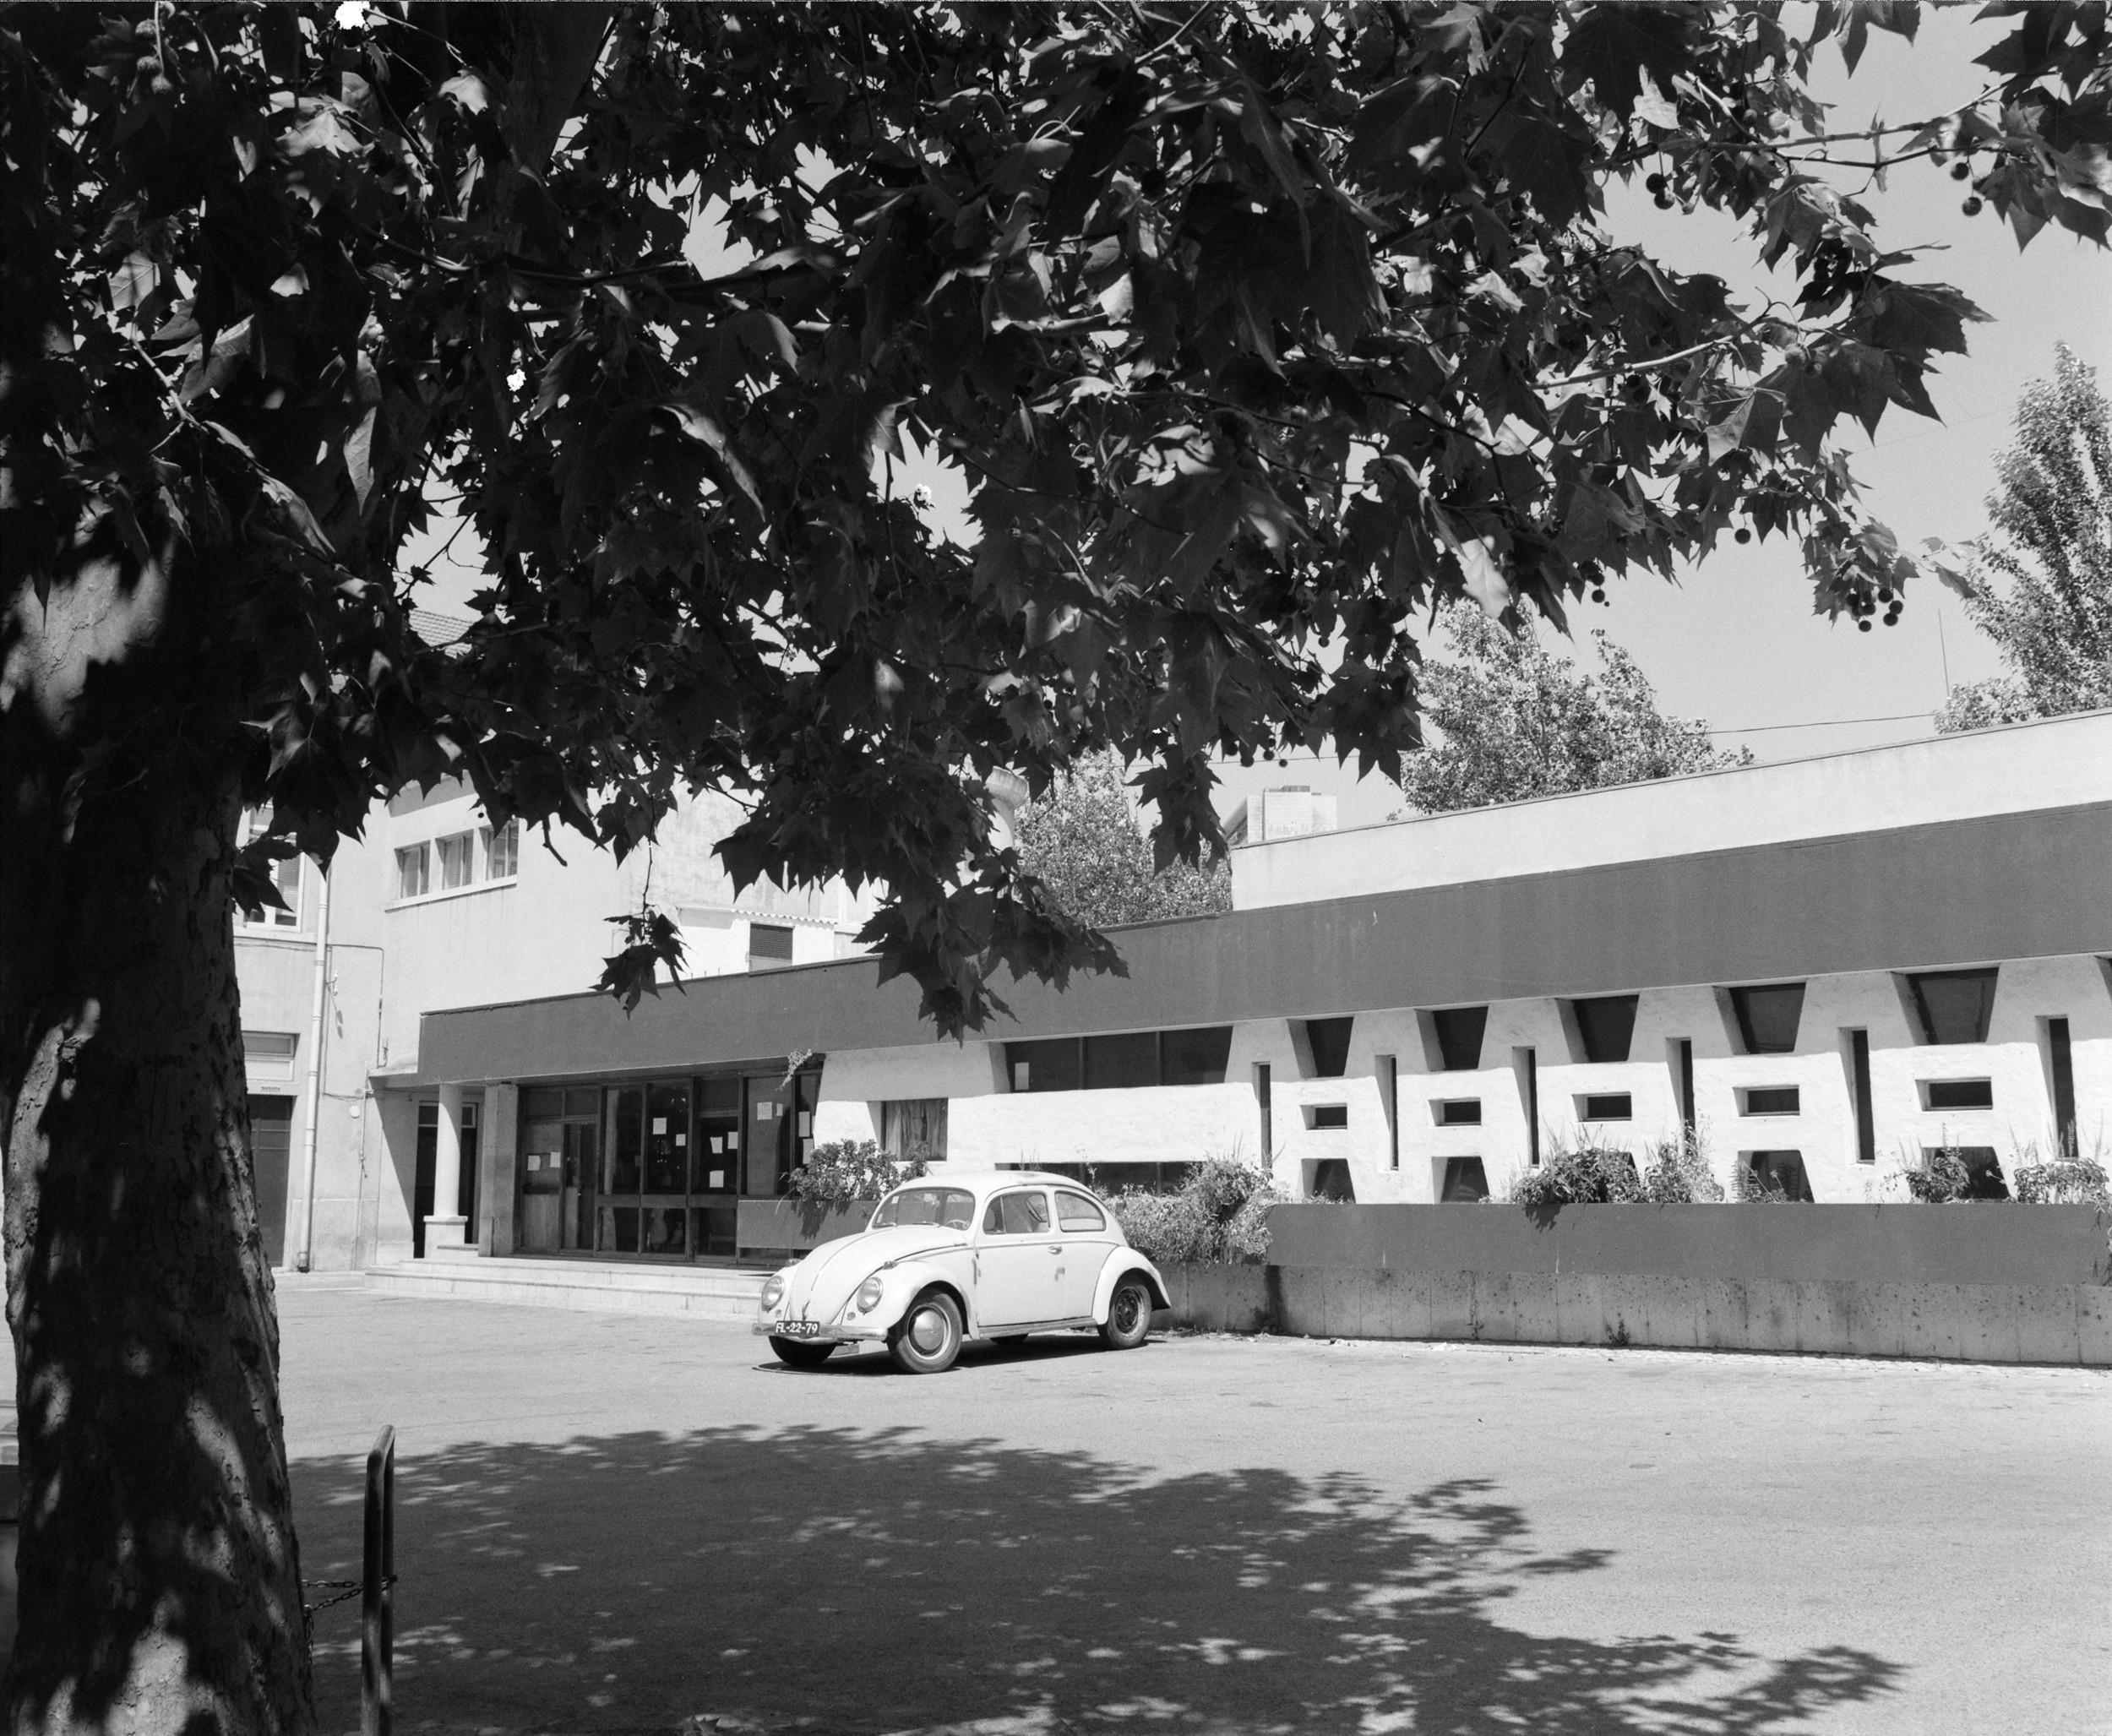 At the time of its formation, the Technical University of Lisbon (Universidade Técnica de Lisboa) had about 1000 students and 100 teachers, which increased by the mid 1940s to roughly 3000 students and 200 teachers.  Photo: Studio Mário Novais, ca. 1975-1988, Lisbon  Biblioteca de Arte da Fundação Calouste Gulbenkian [CFT003 075453]